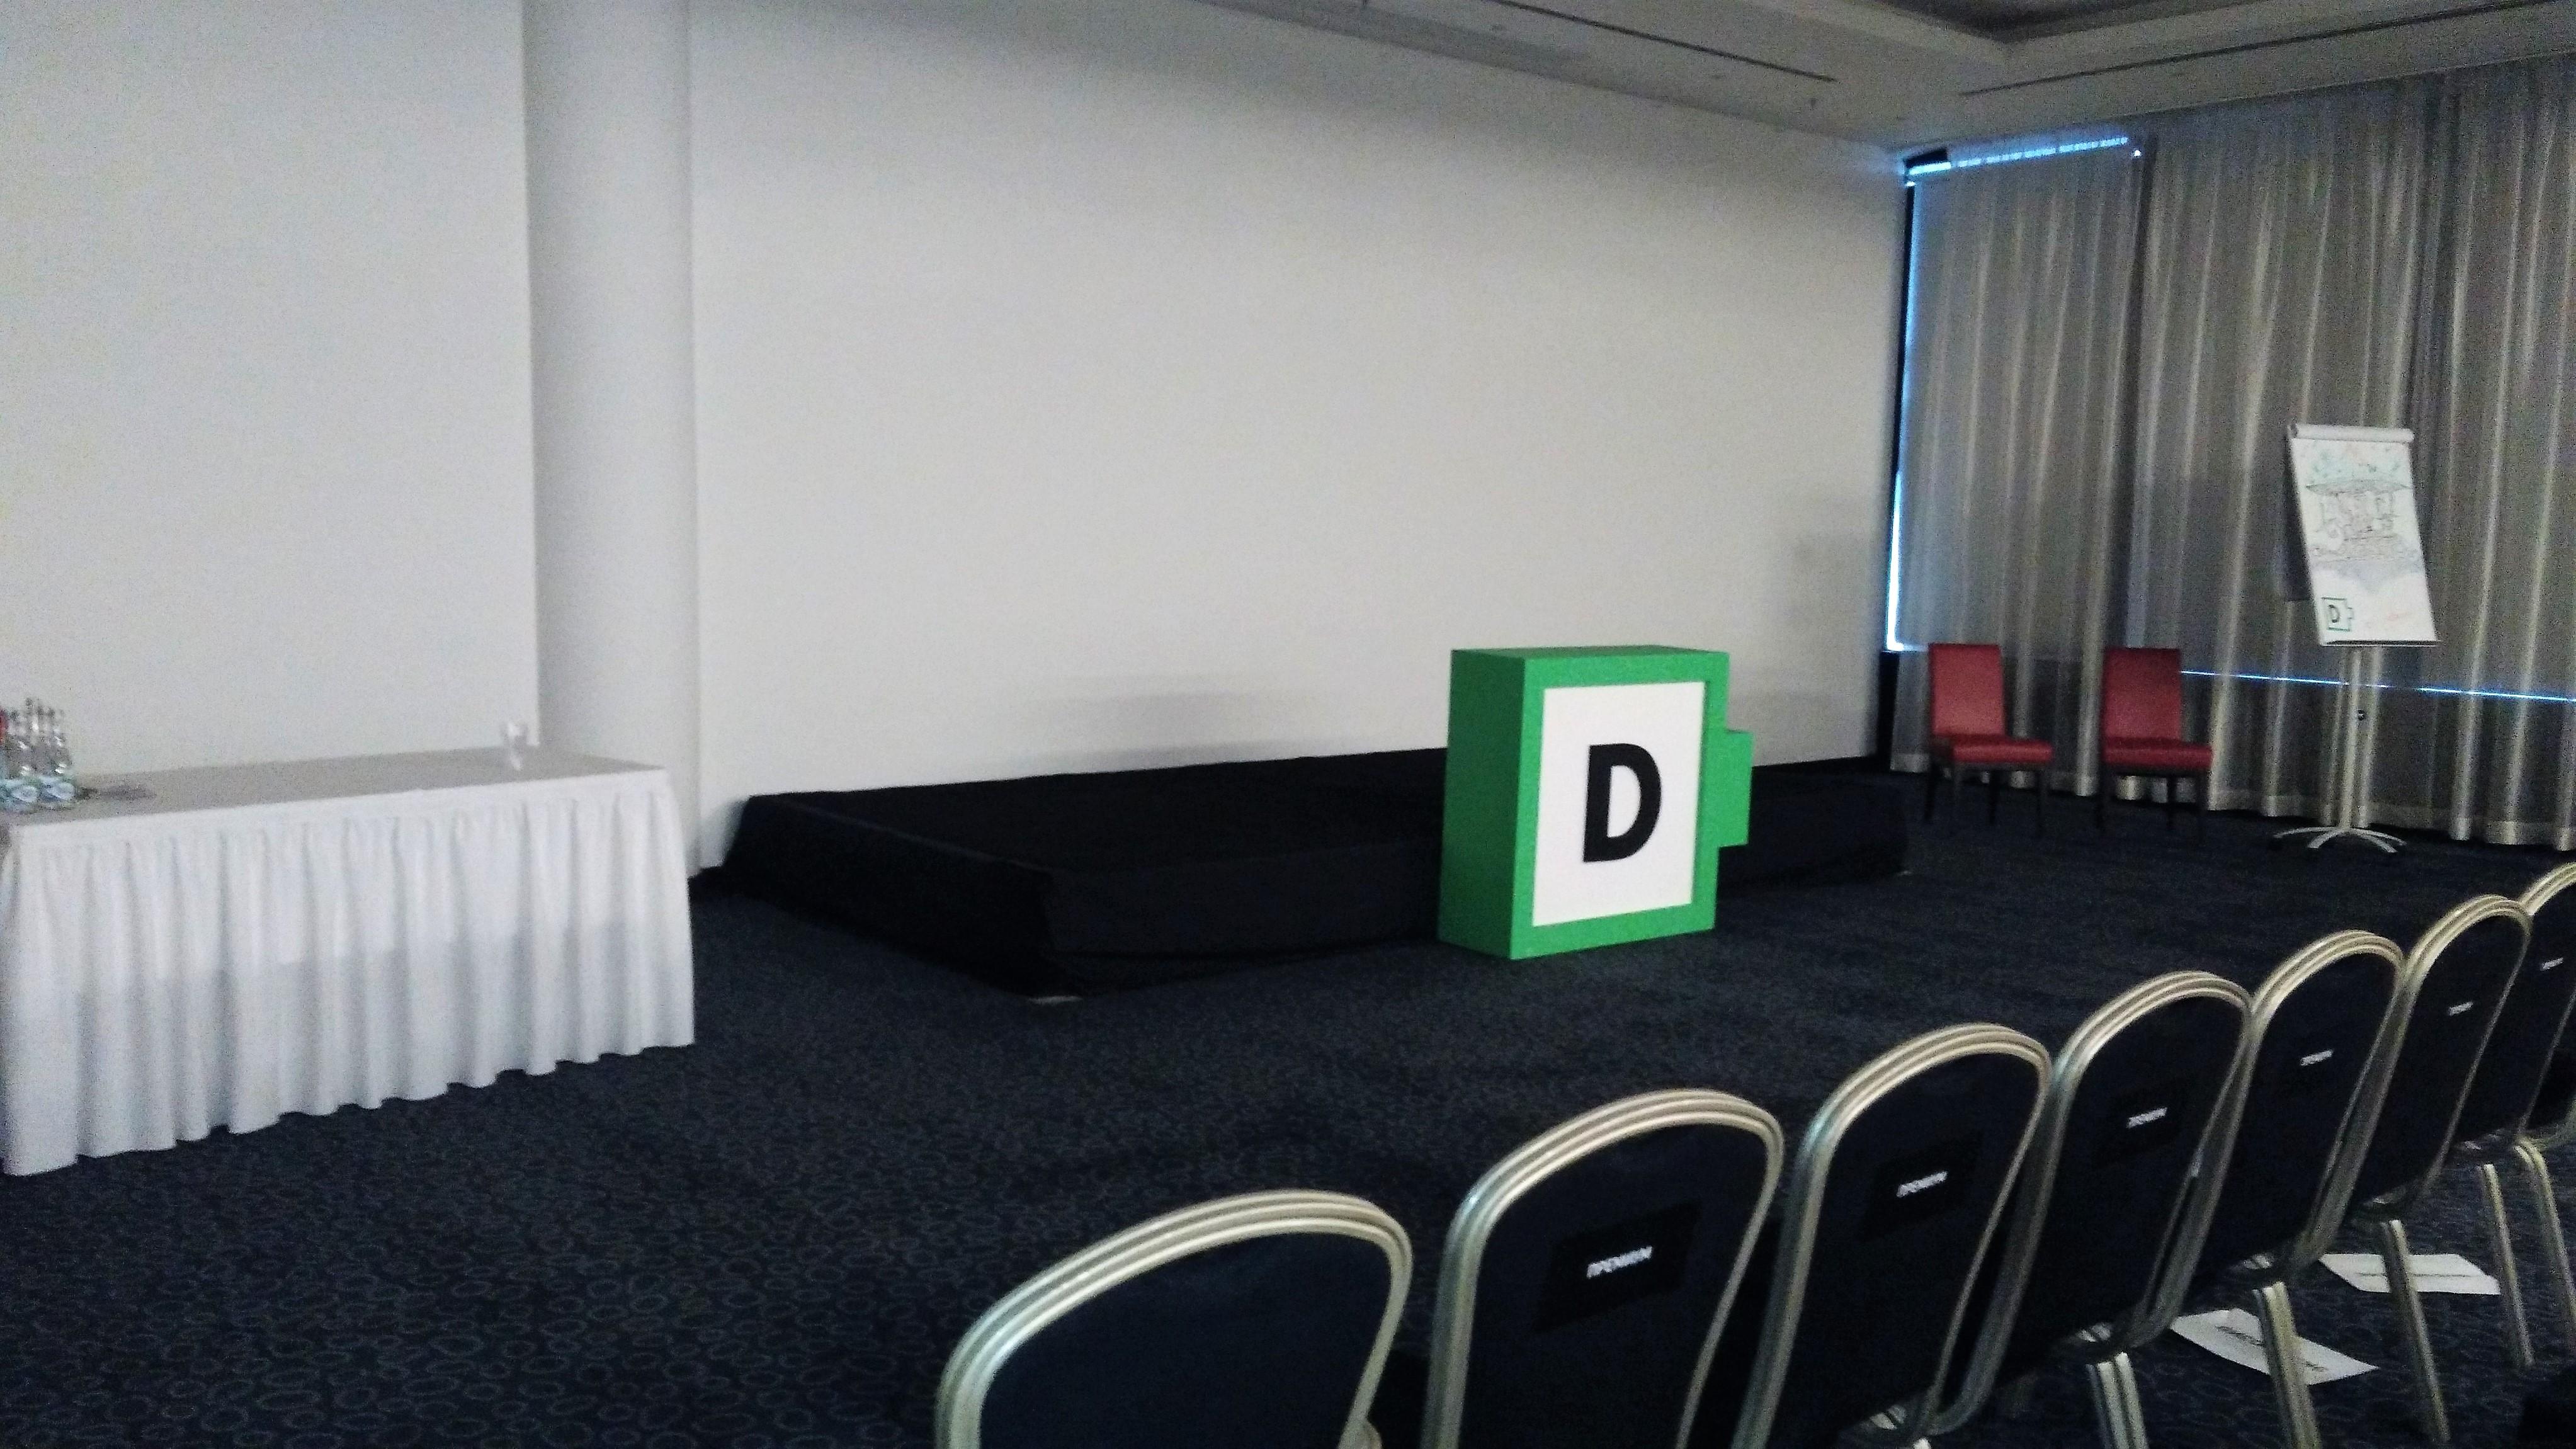 Аренда подиума конференция Digitale 2017